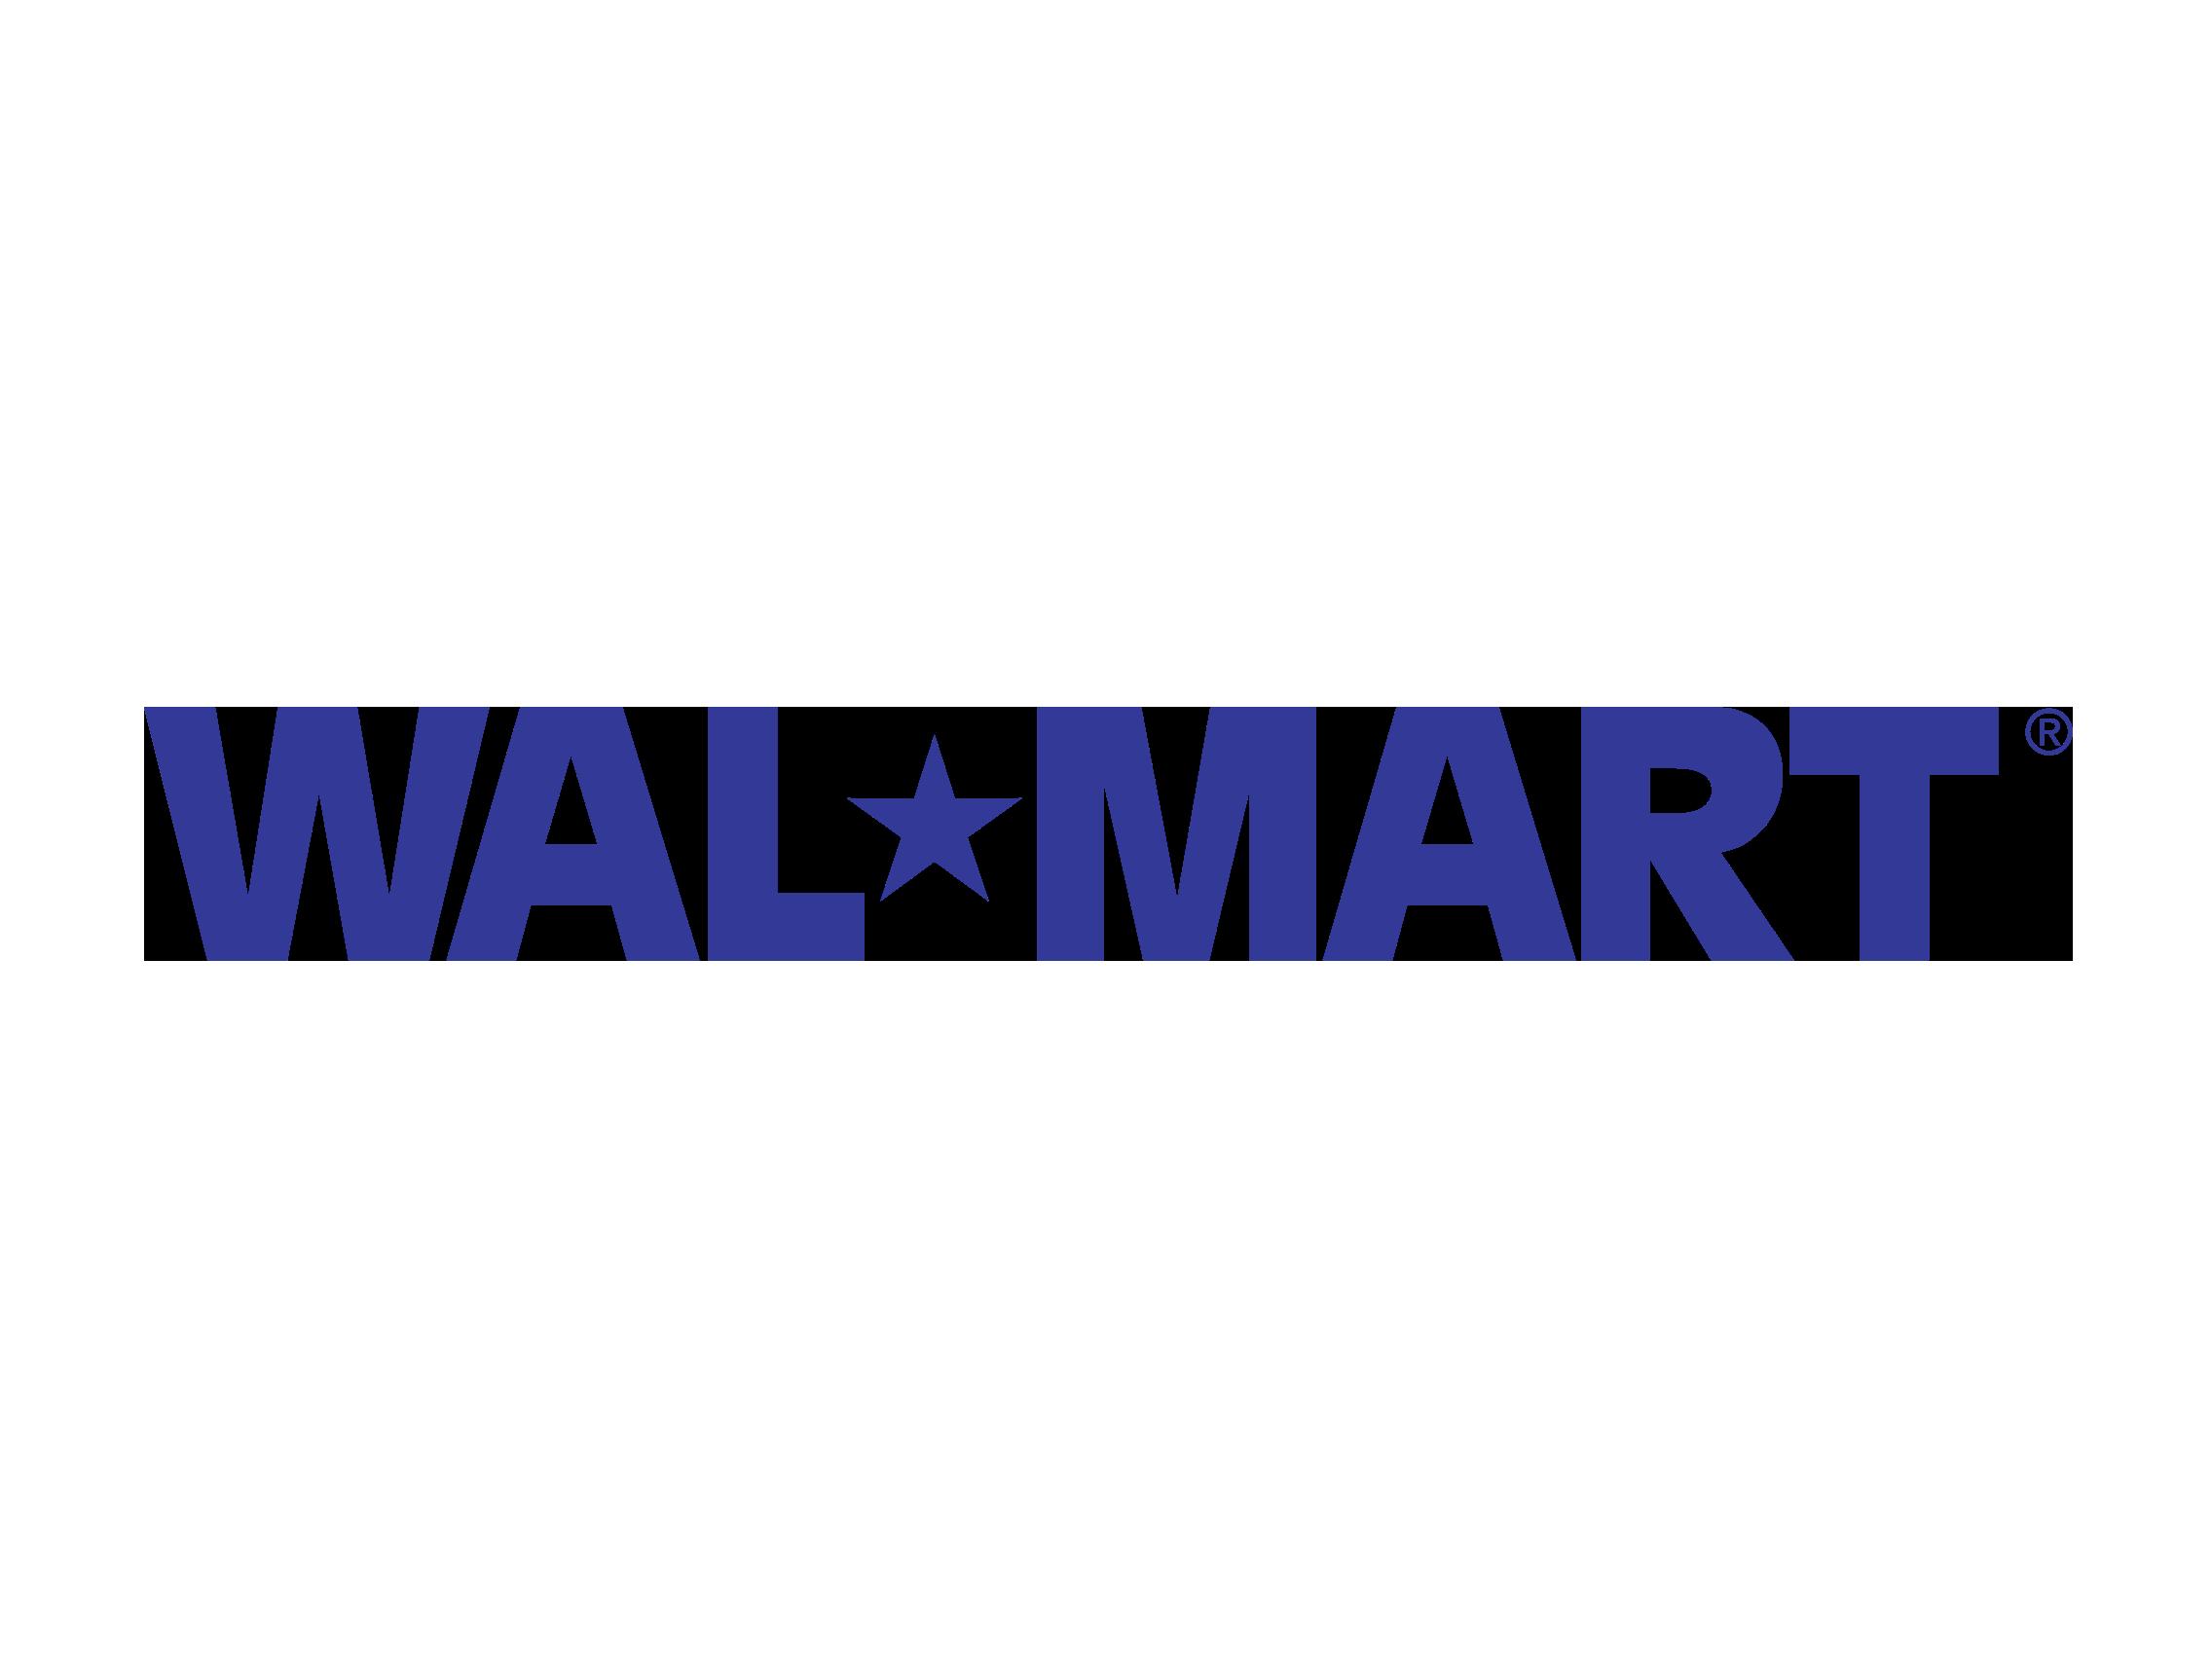 Walmart Logo In Png